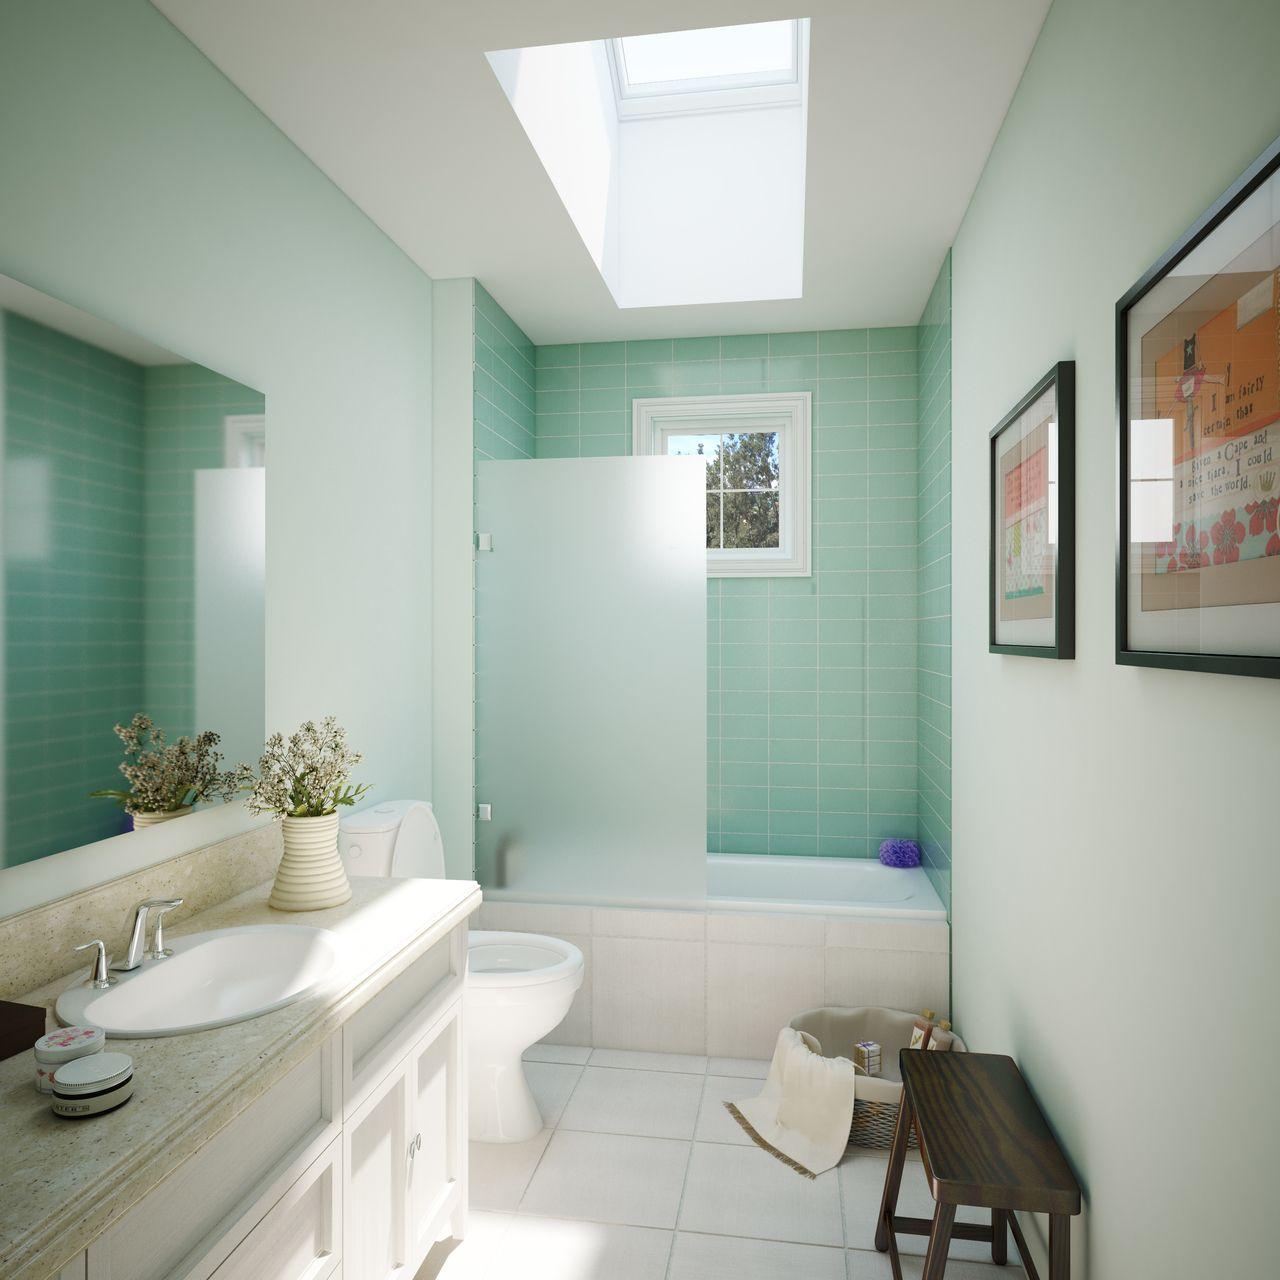 Modern Ative Tiles Bathroom Picture Collection - Bathtub Ideas ...